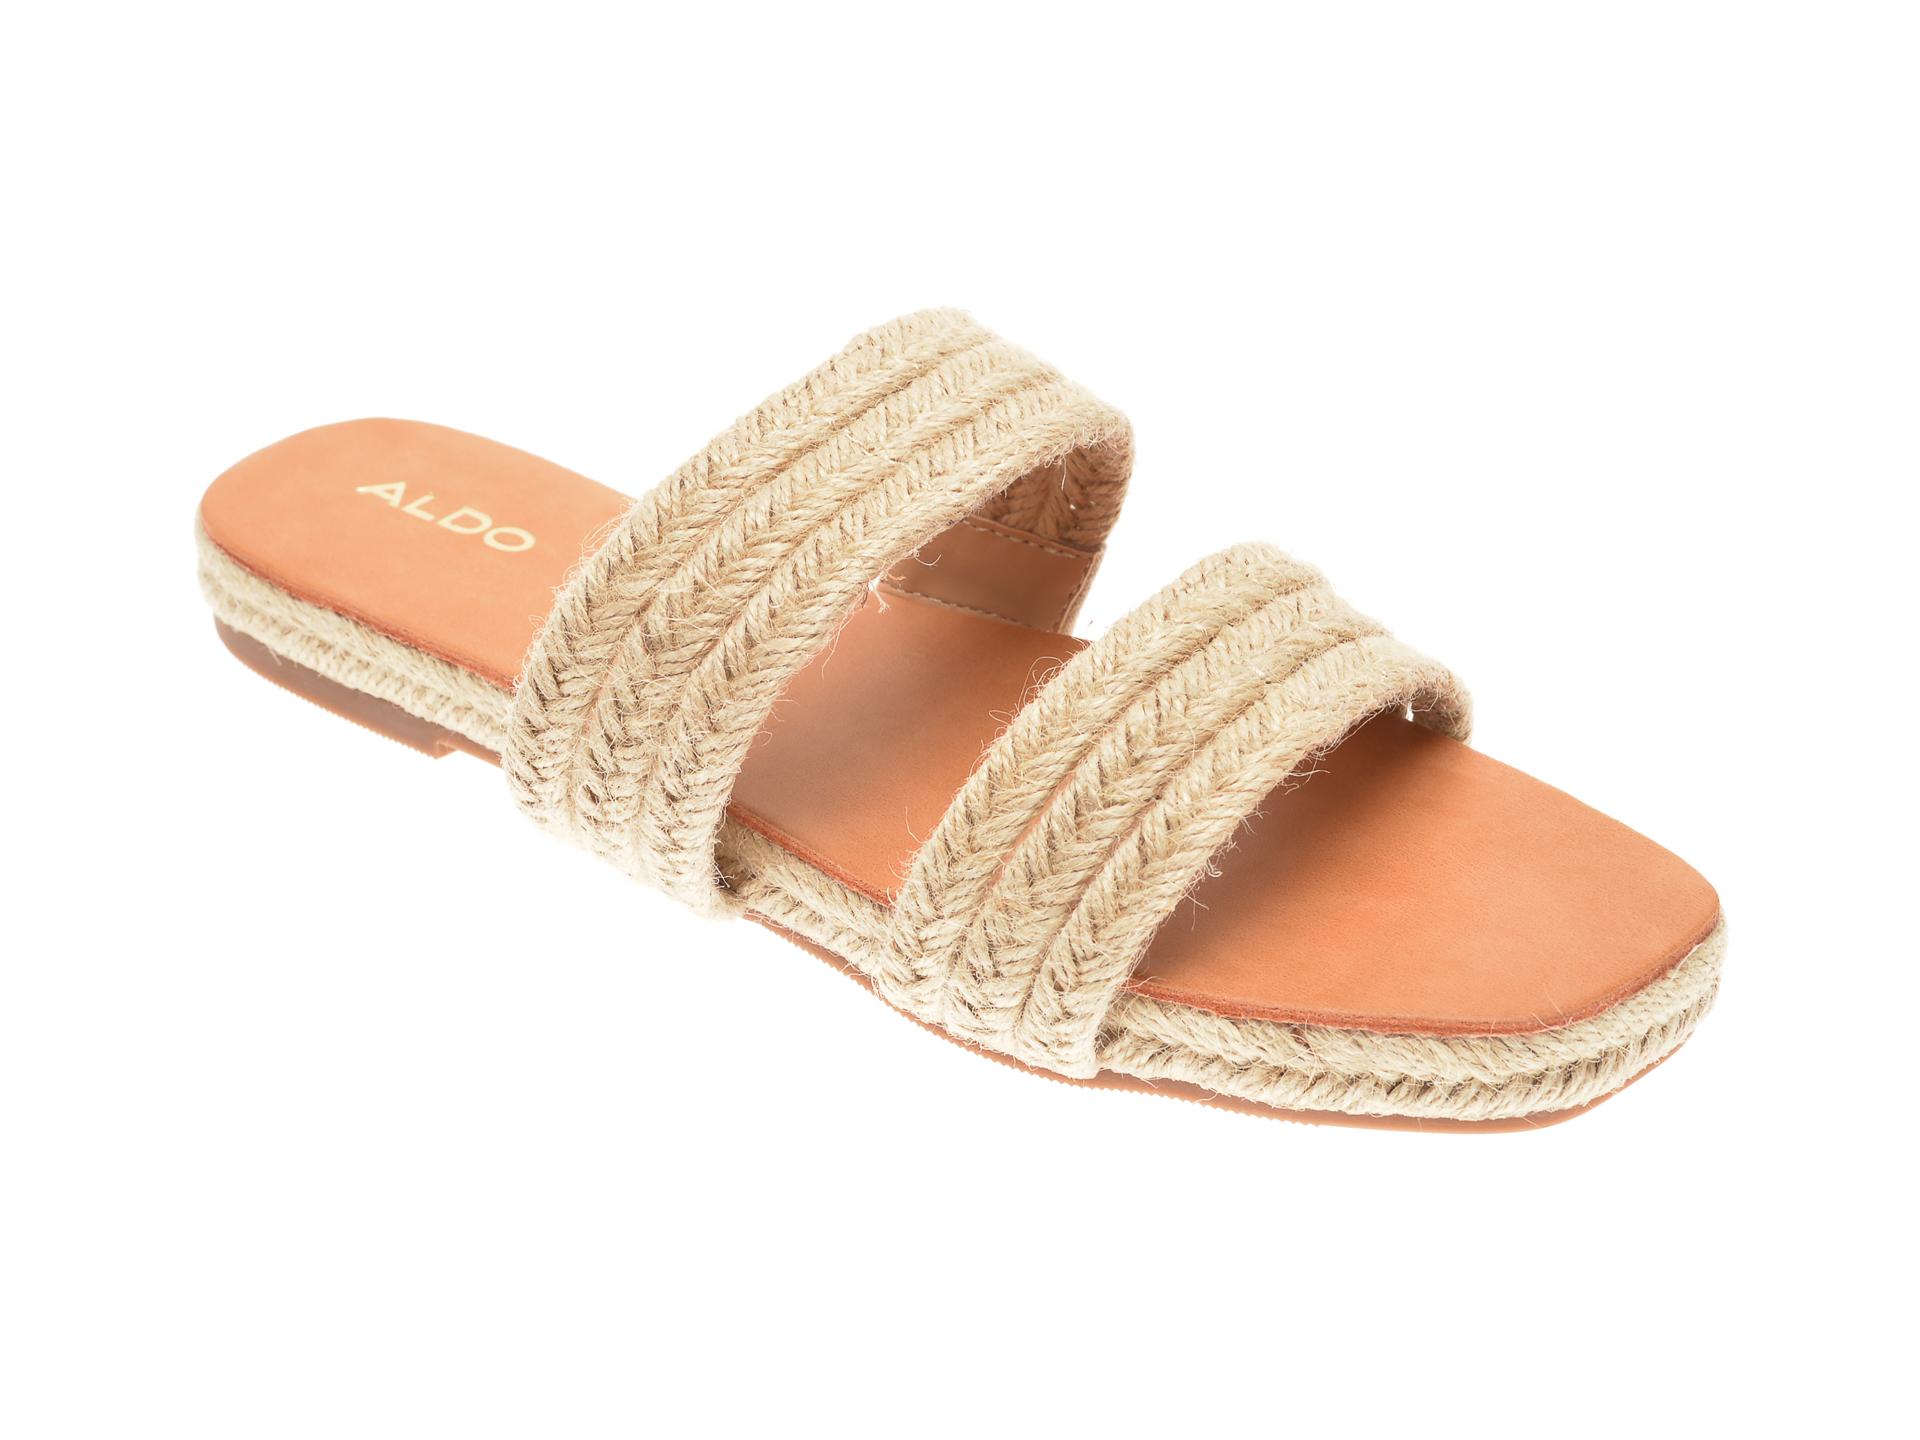 Papuci ALDO bej, Bistra101, din material textil